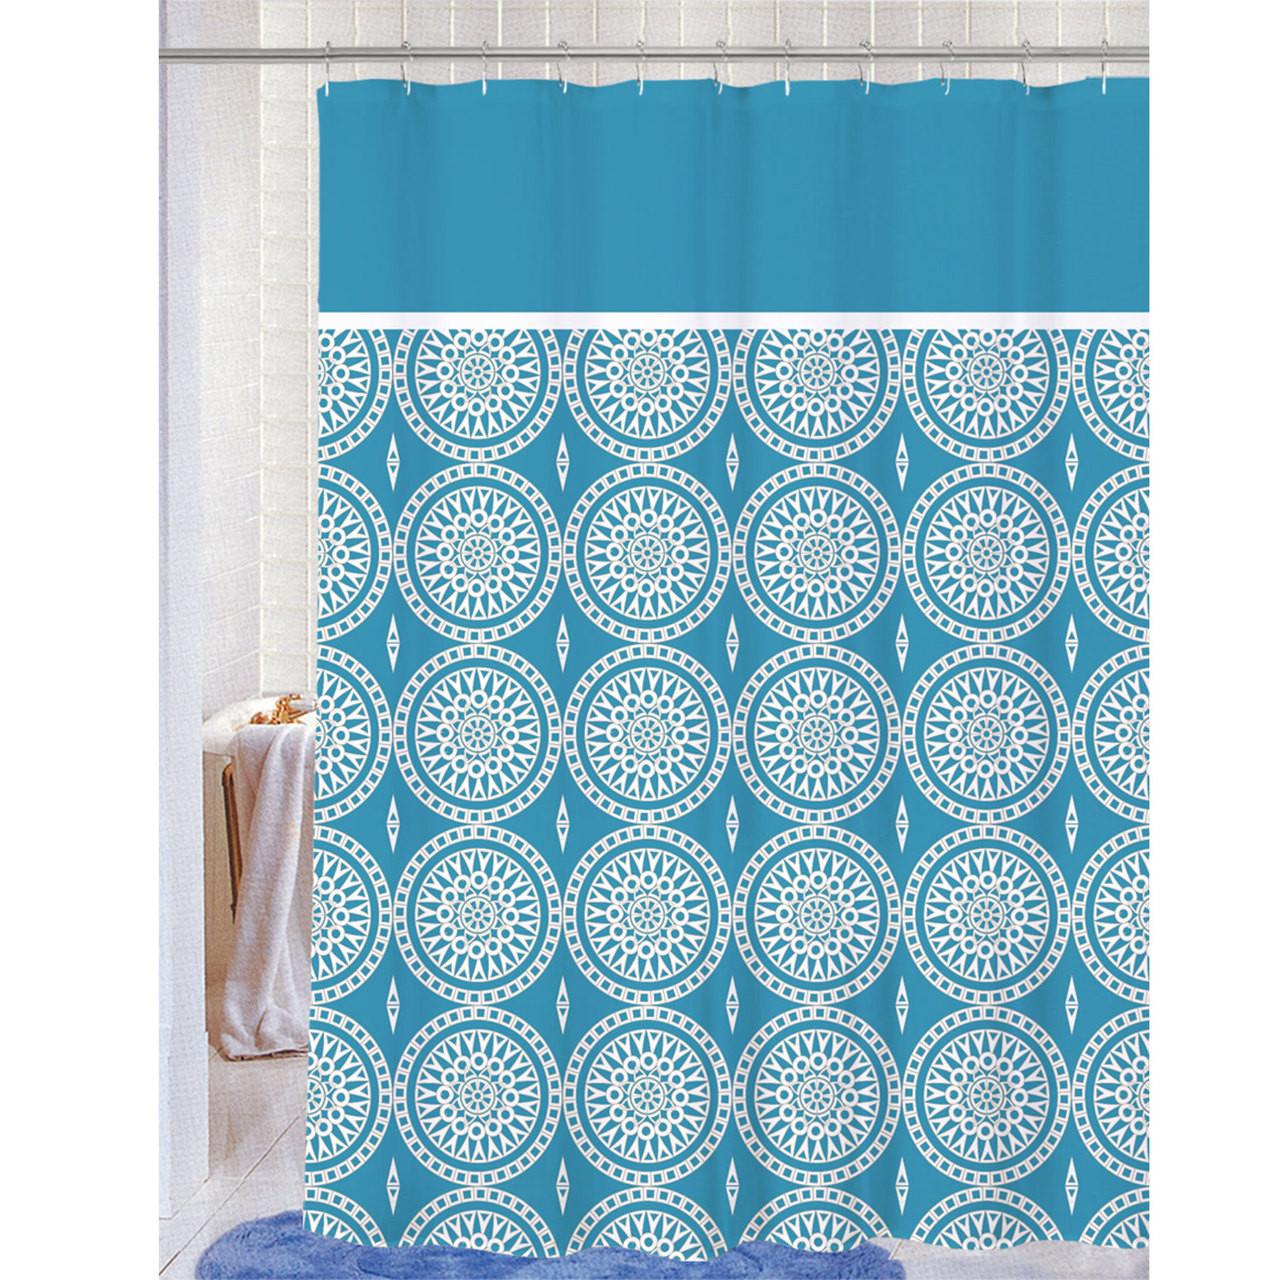 Soft Microfiber Fabric Printed Shower Curtain Geometric Medallion Design 70x72 Blaire